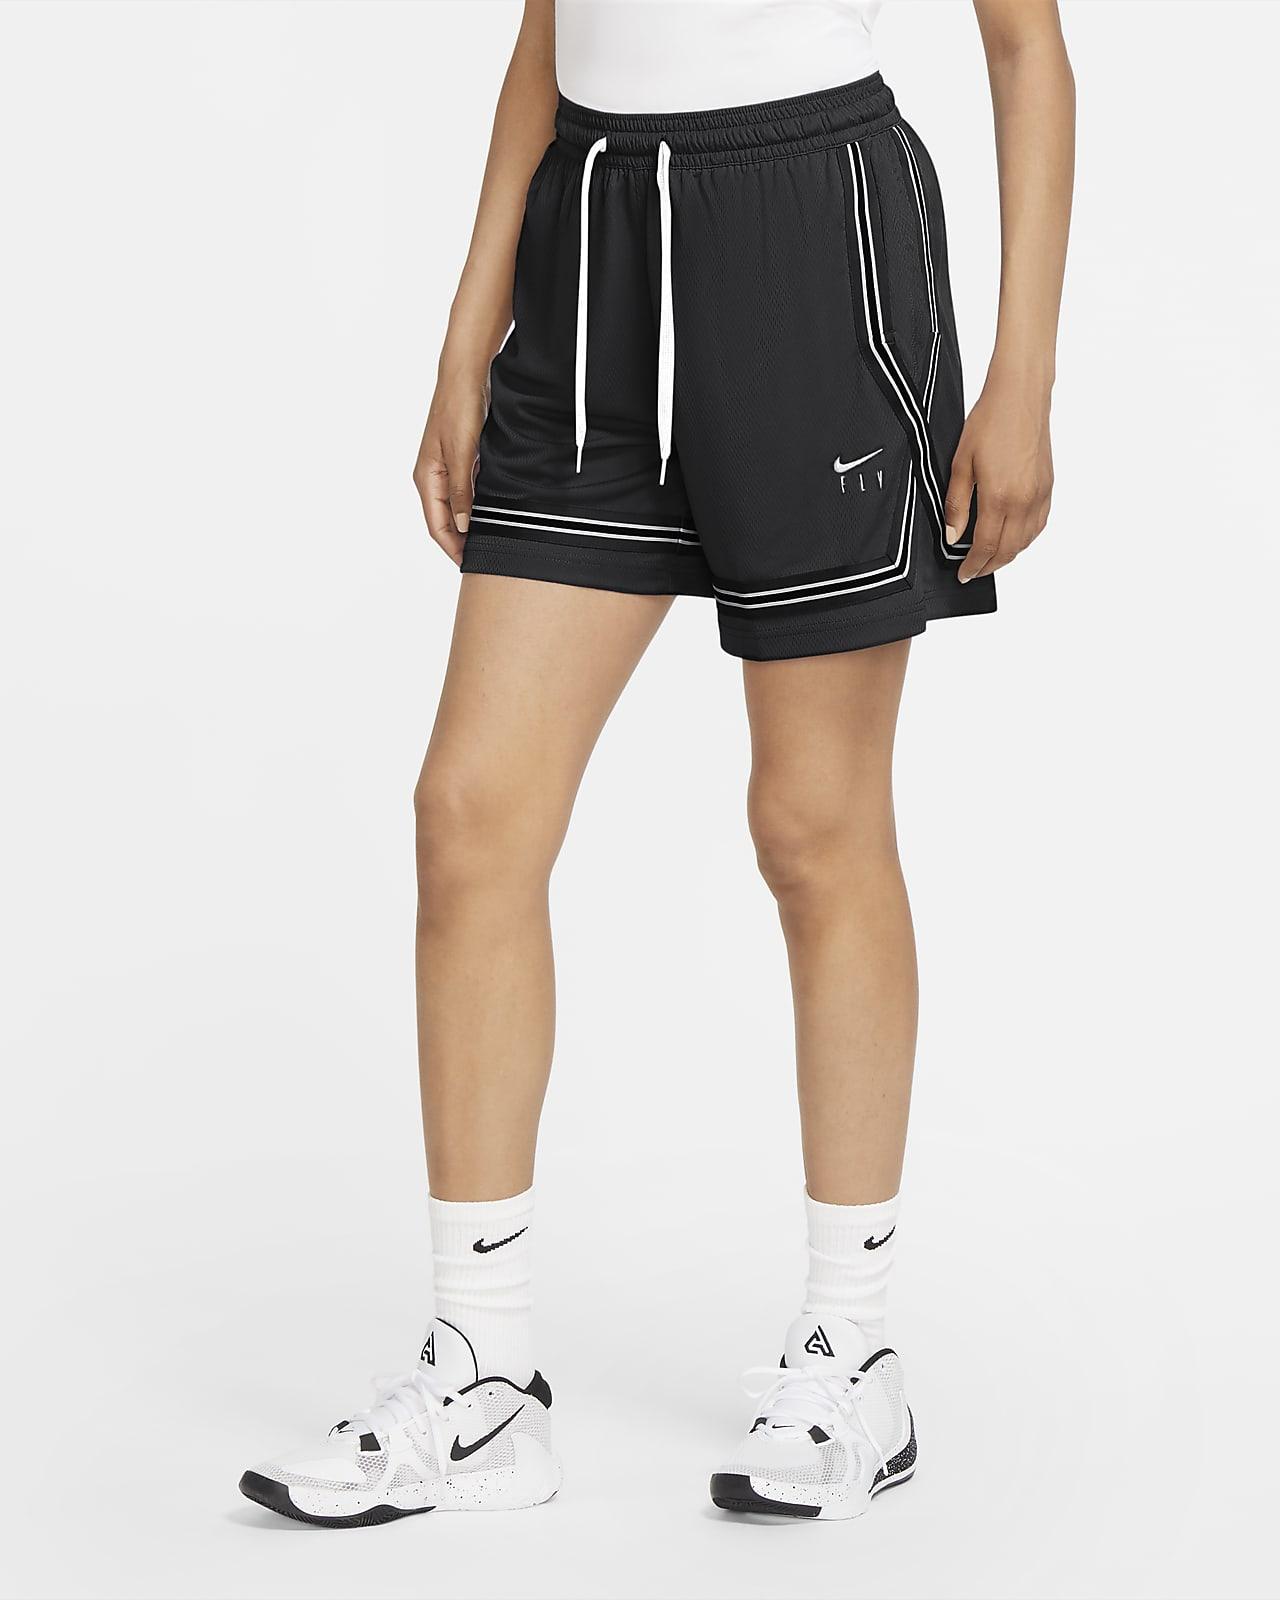 Nike Dri-FIT Swoosh Fly Women's Basketball Shorts